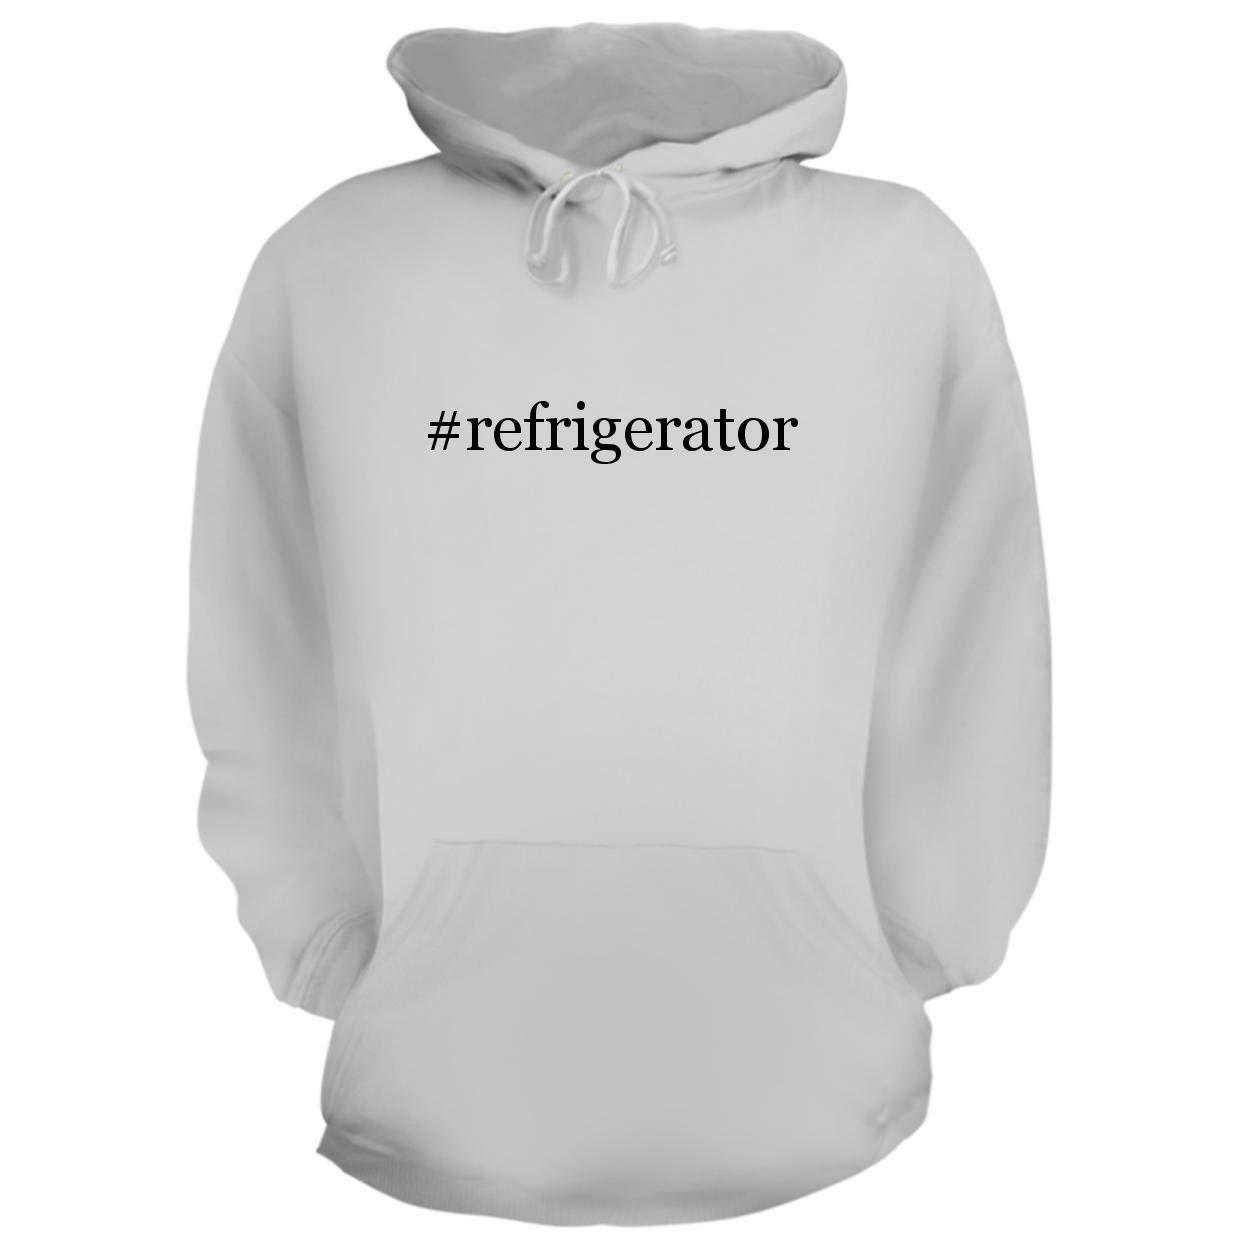 BH Cool Designs #Refrigerator - Graphic Hoodie Sweatshirt